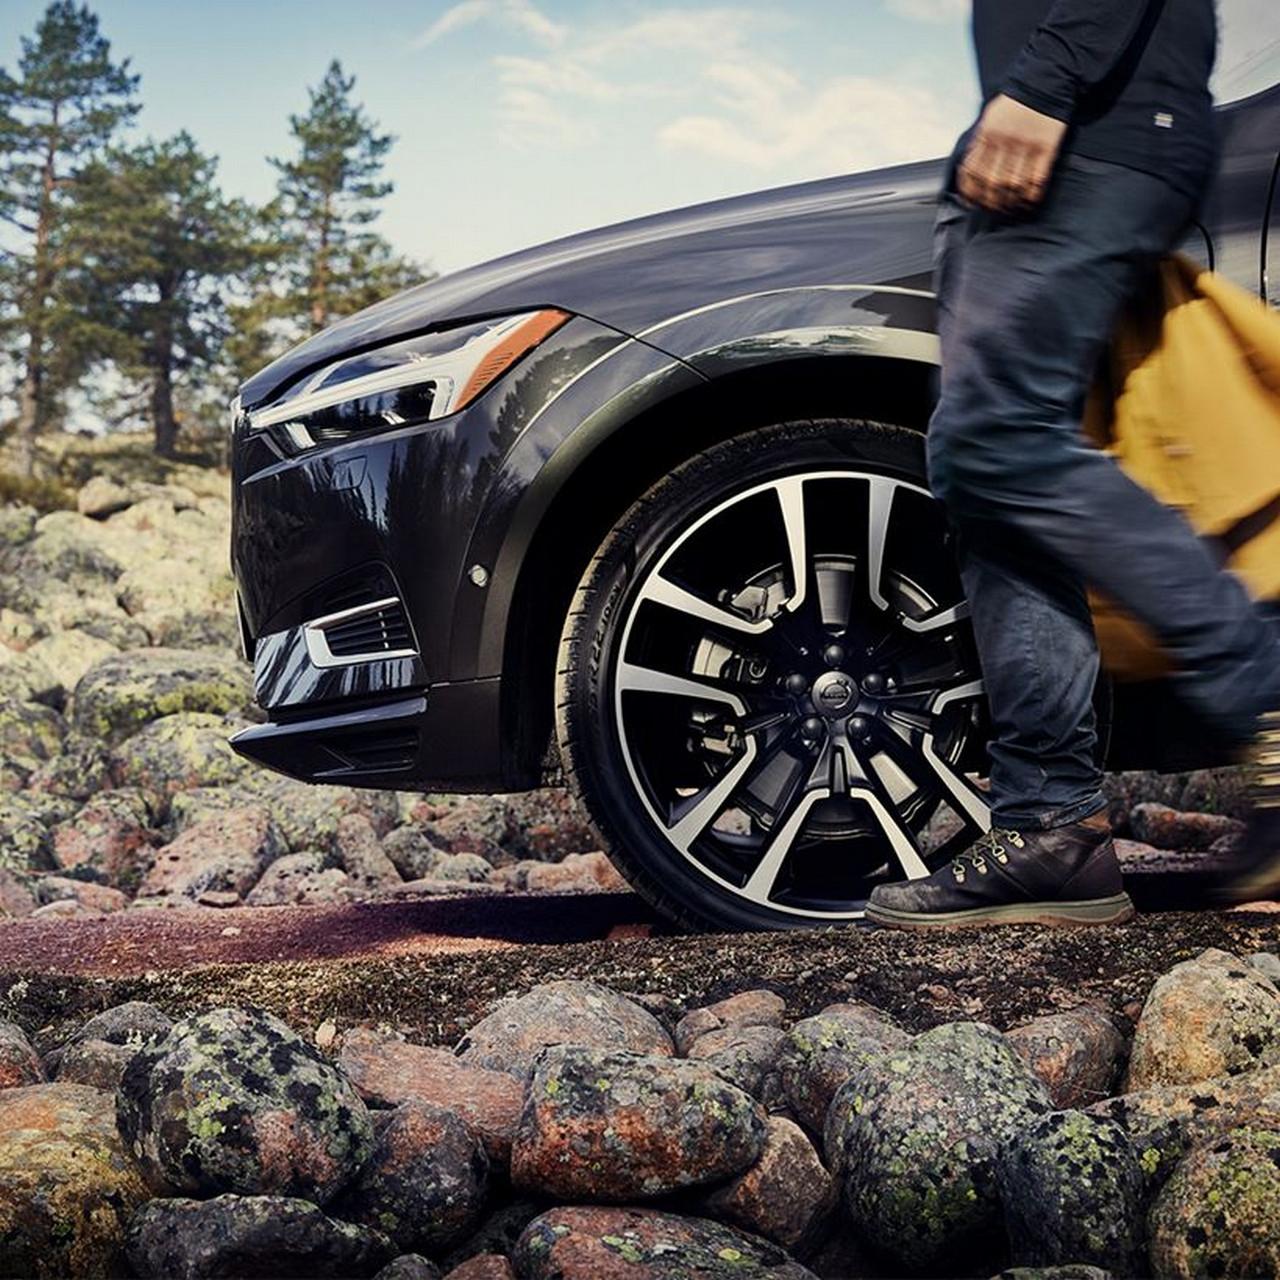 Volvo roadside assitance